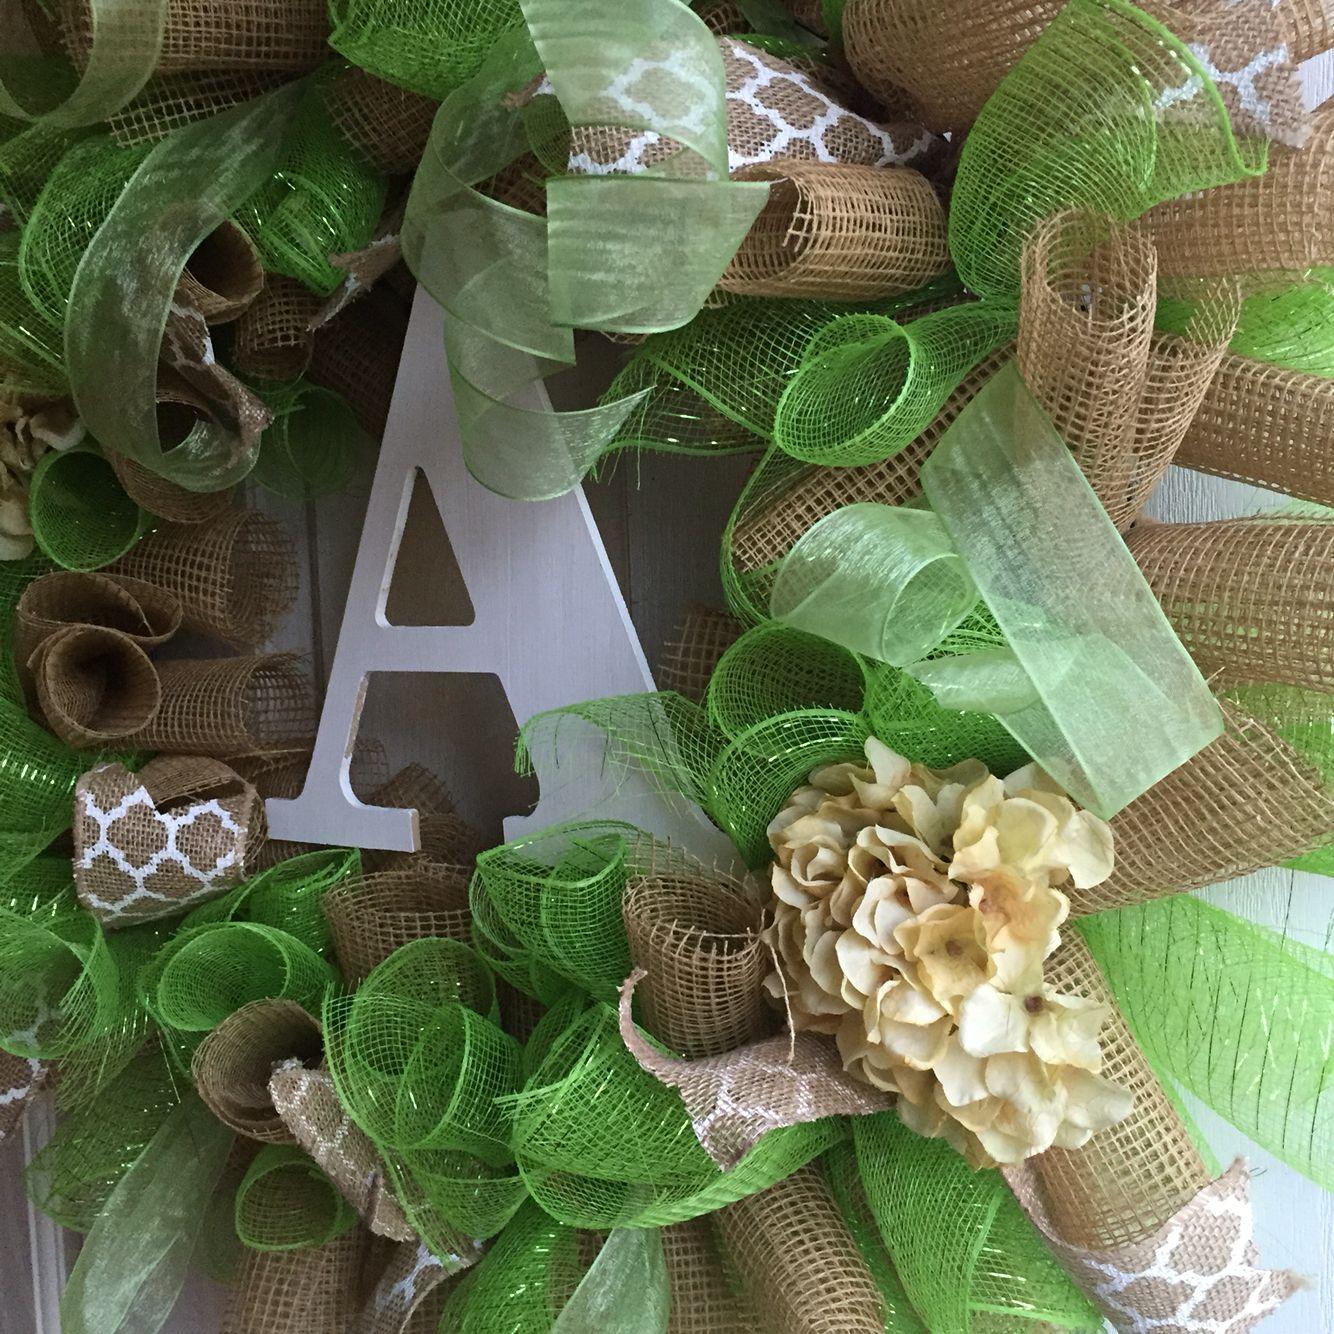 Lovely everyday mesh wreath